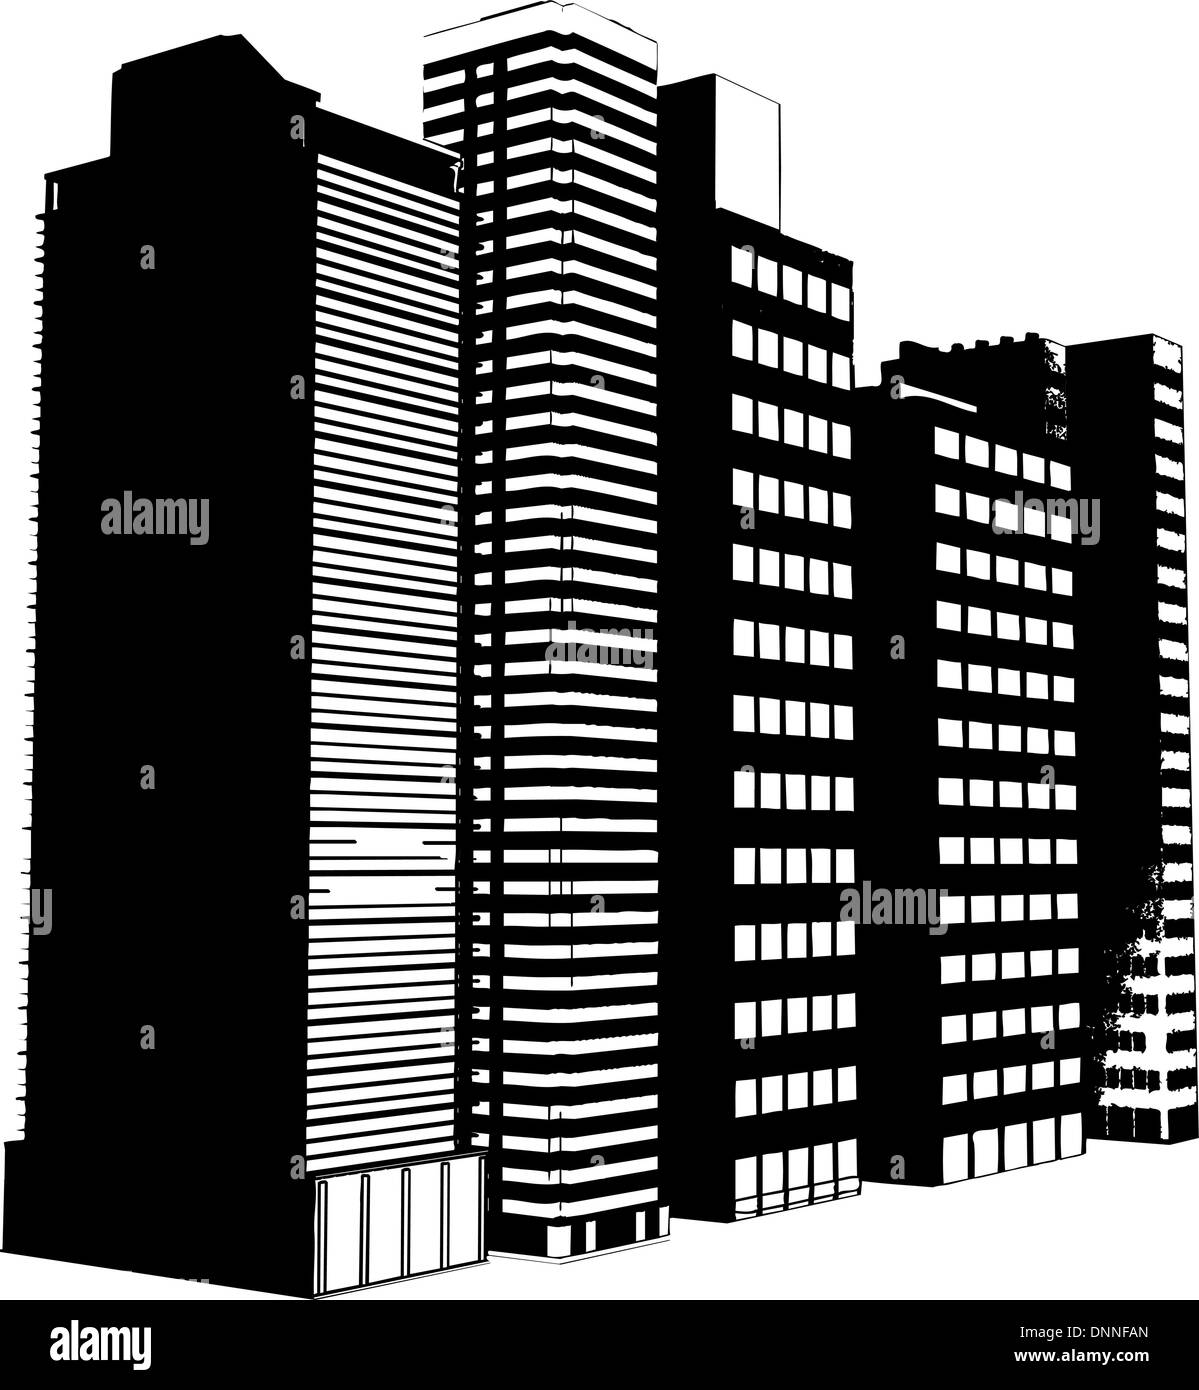 Grunge-Stil Gebäude Stockbild